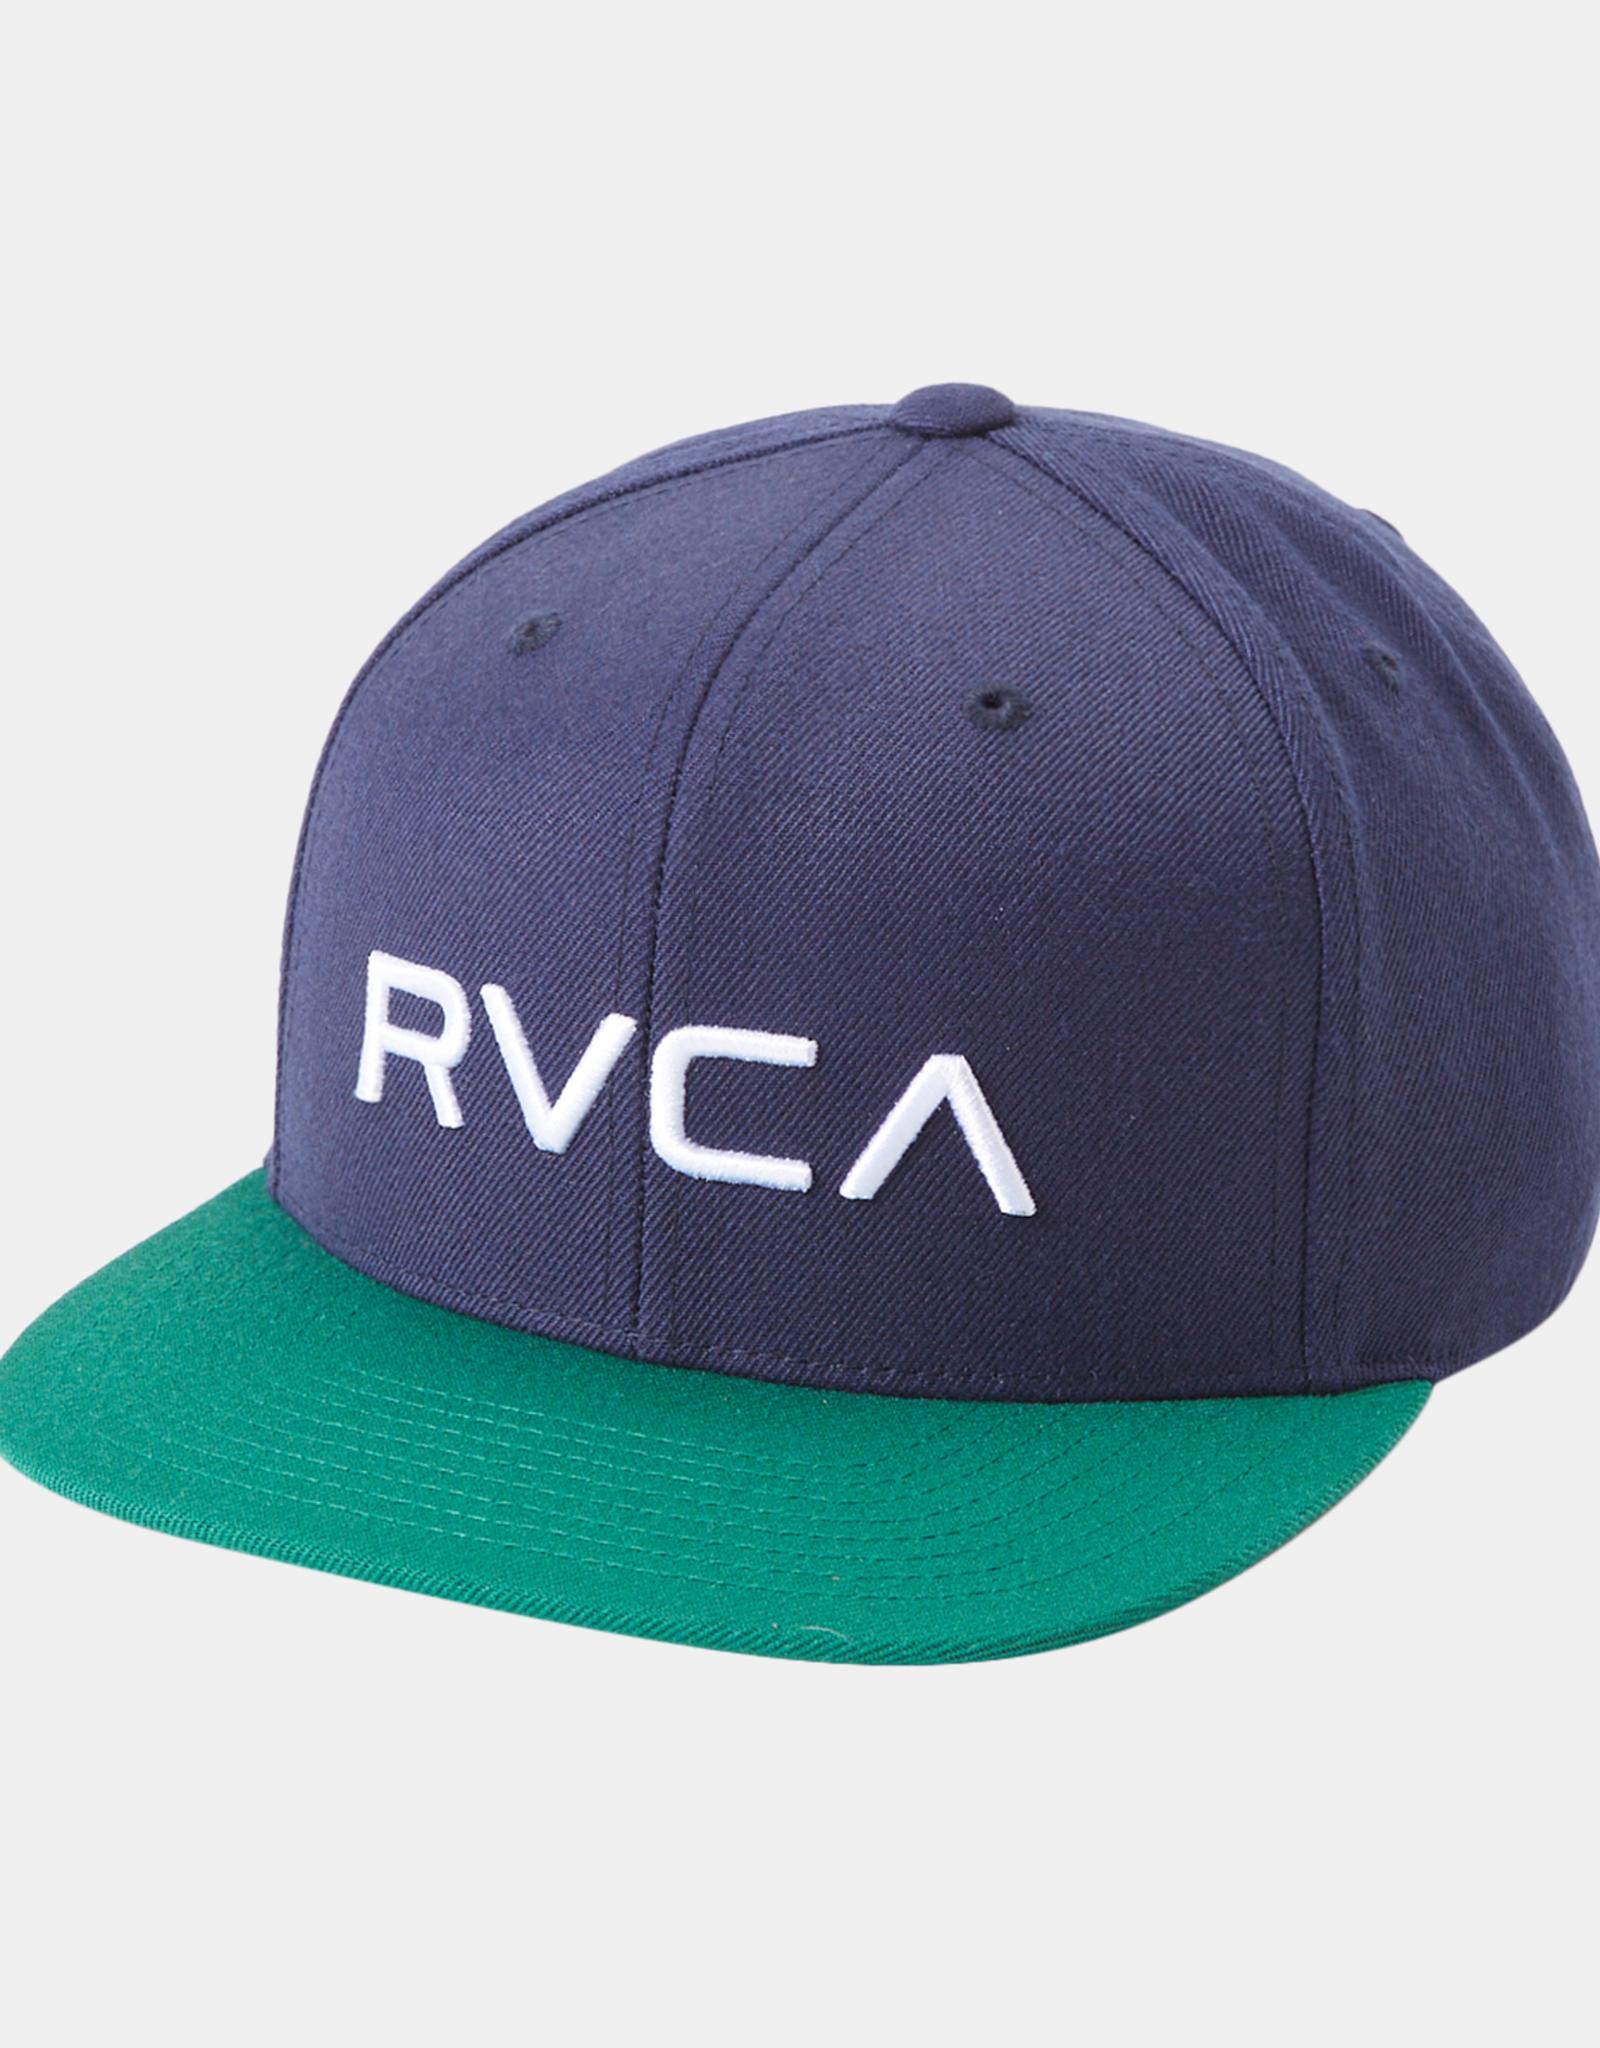 RVCA RVCA  Snap II N27